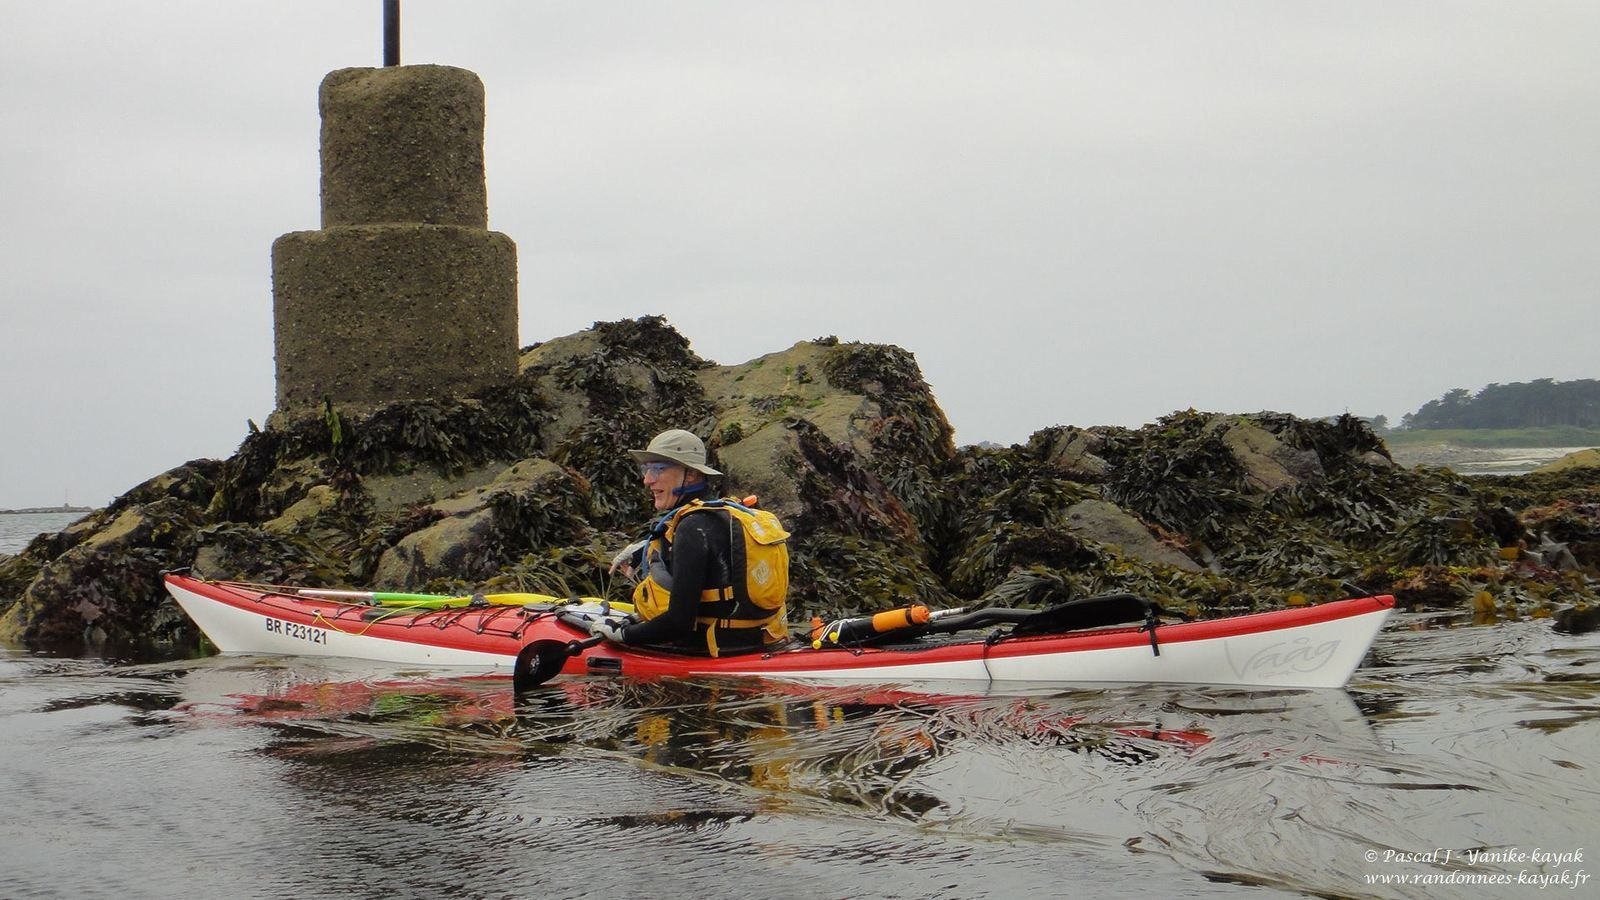 Tourduf en kayak de mer : de Locquirec à Sieck (1/9)